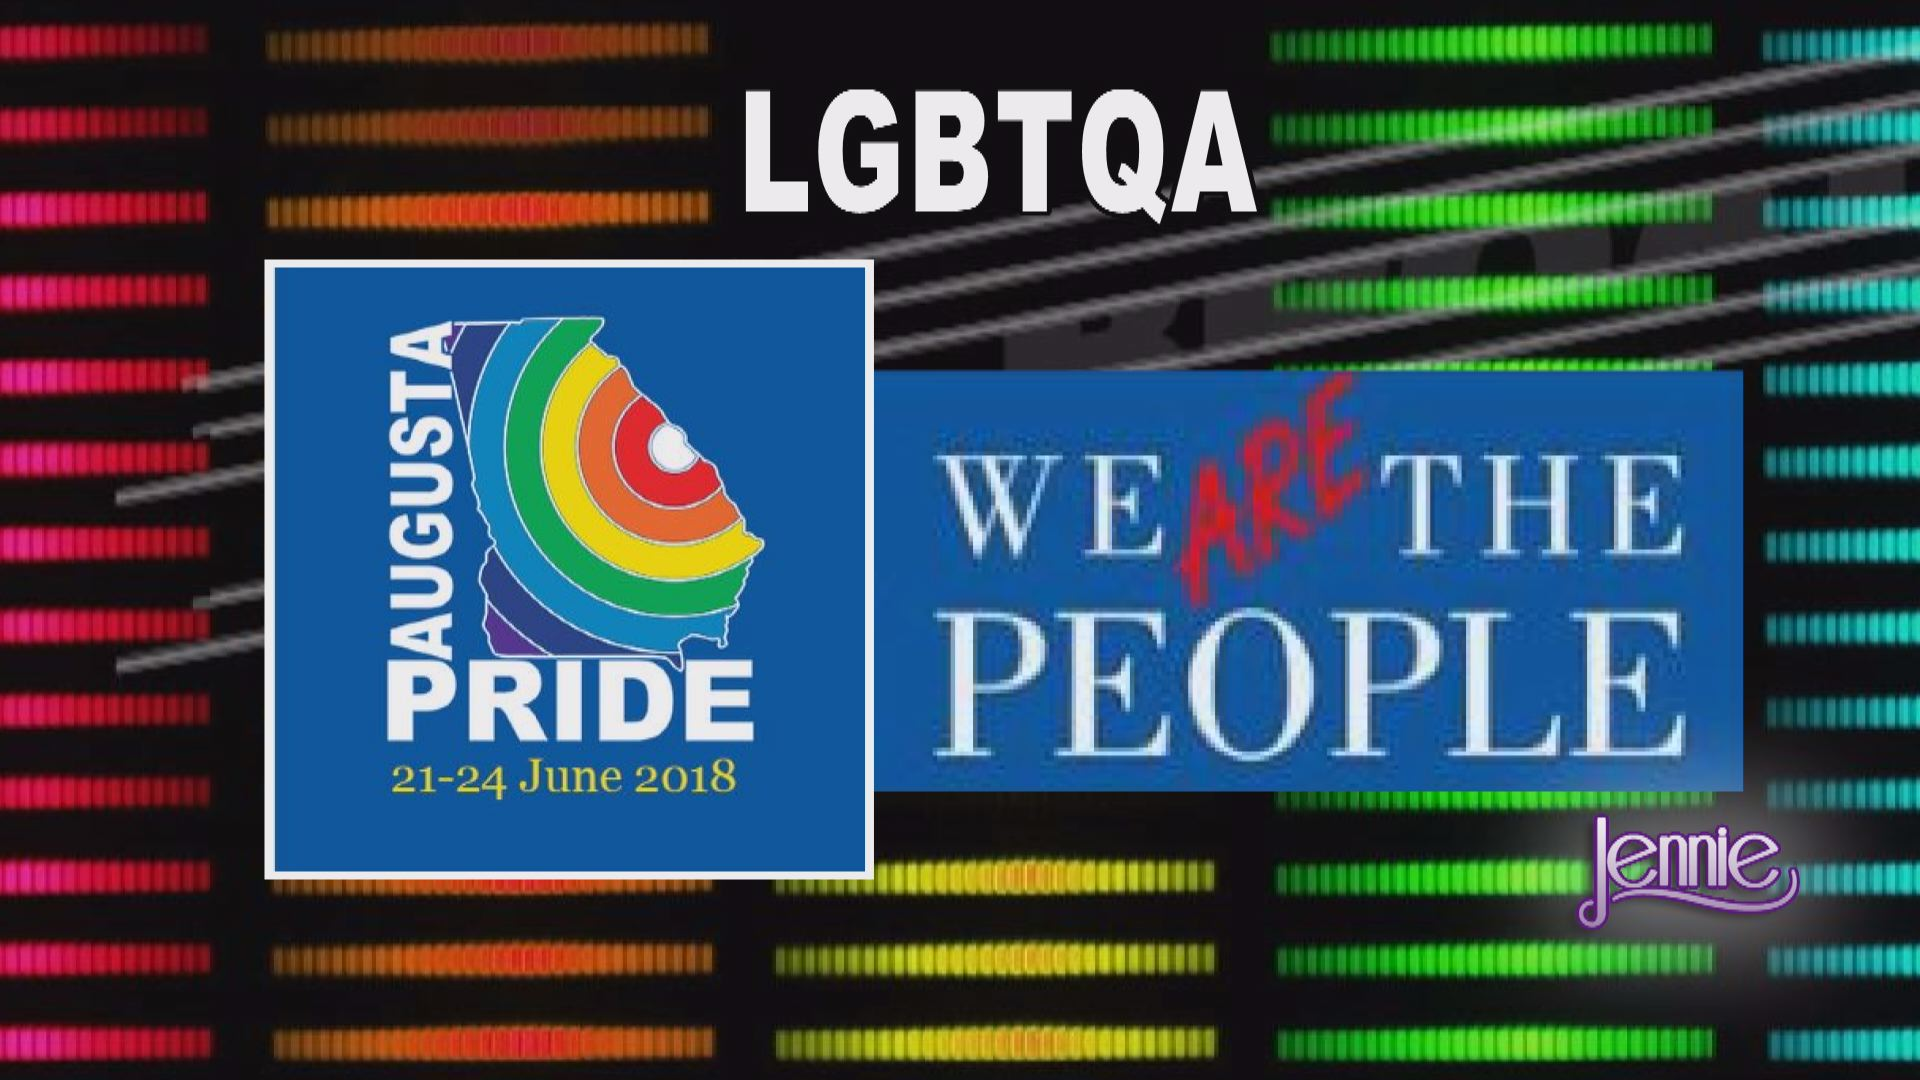 LGBTQA produced_1529444445869.jpg.jpg